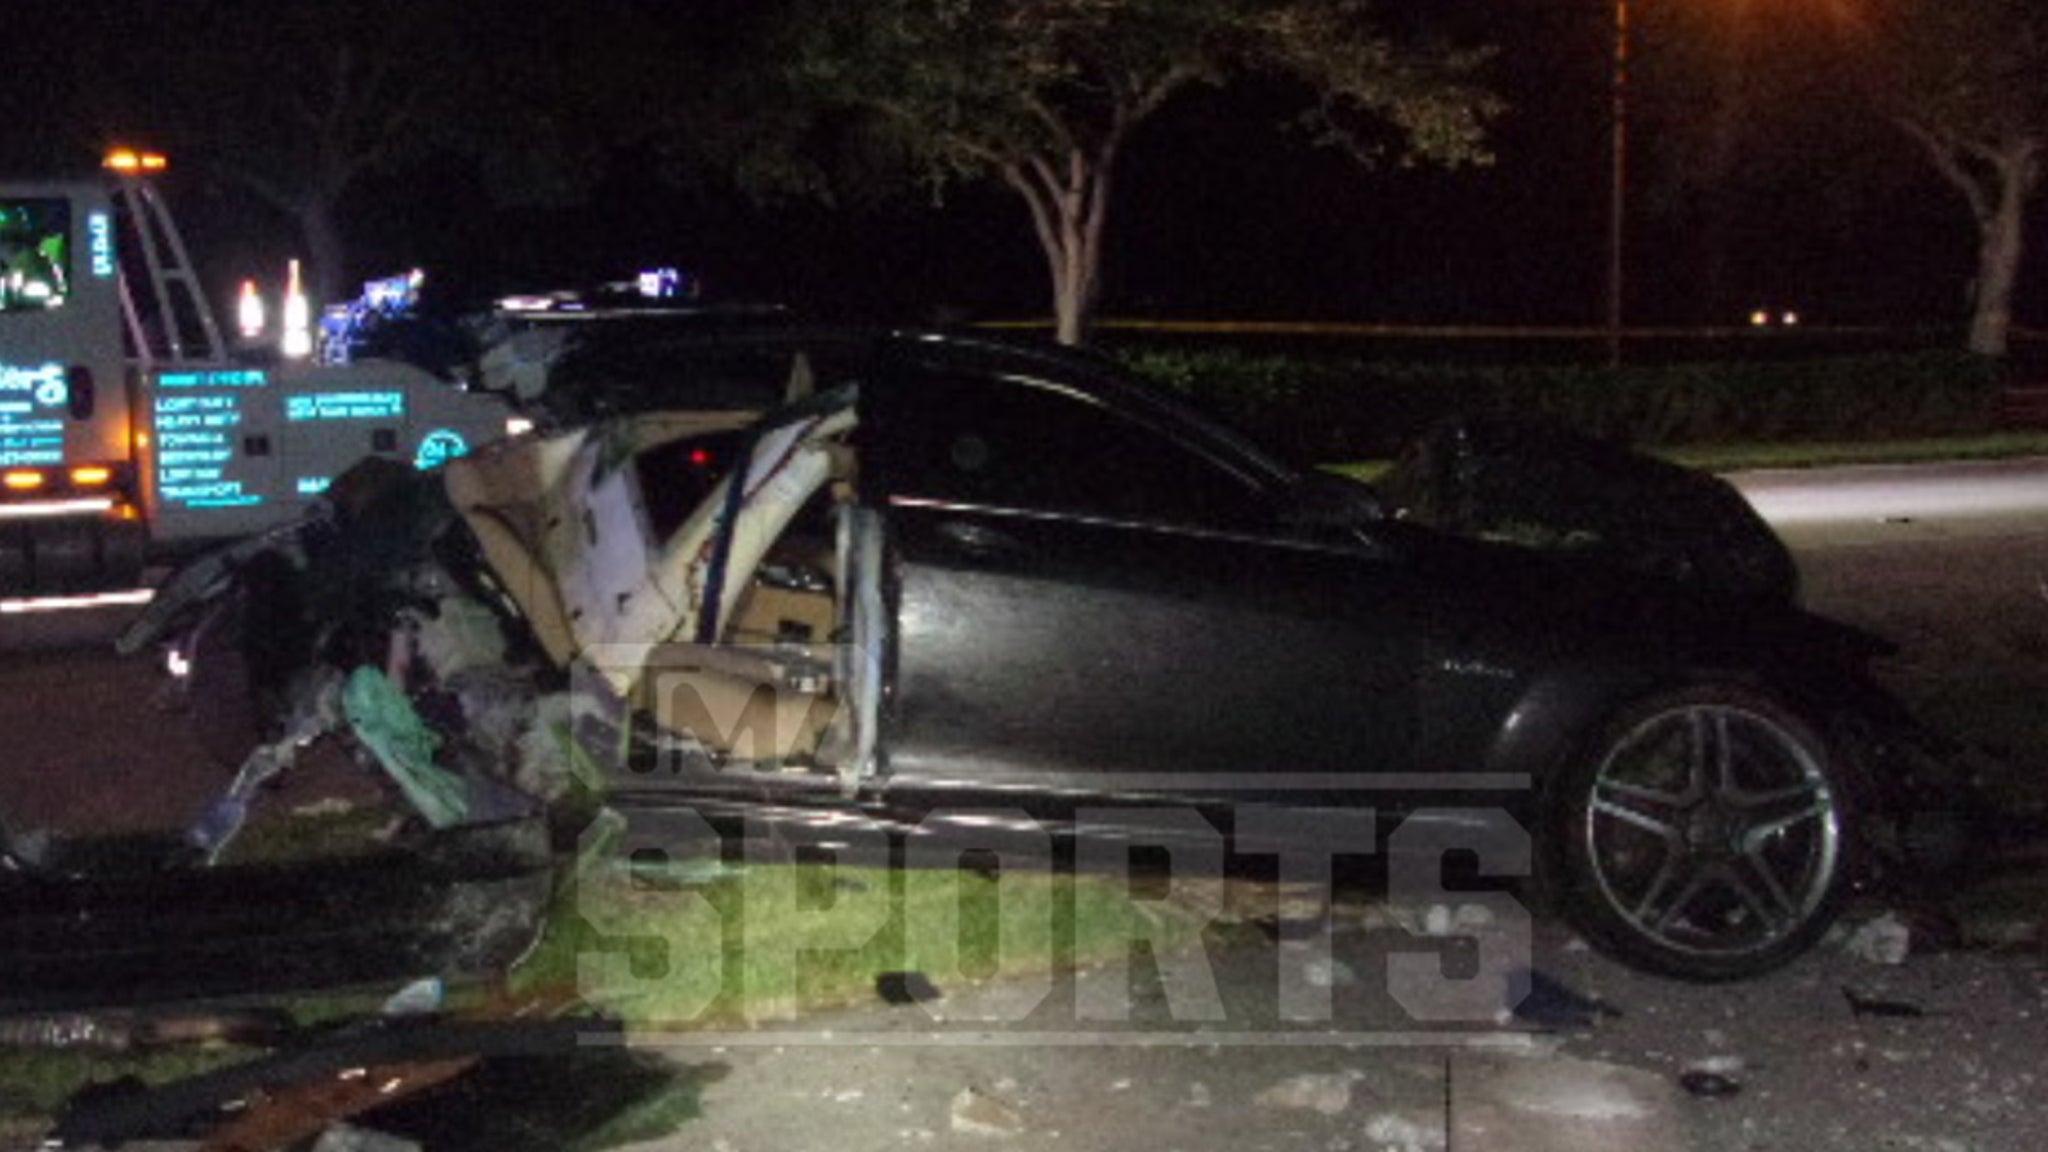 Ex-NFL Star Deltha O'Neal DUI Case Crash Pics Show Insanely Mangled Mercedes